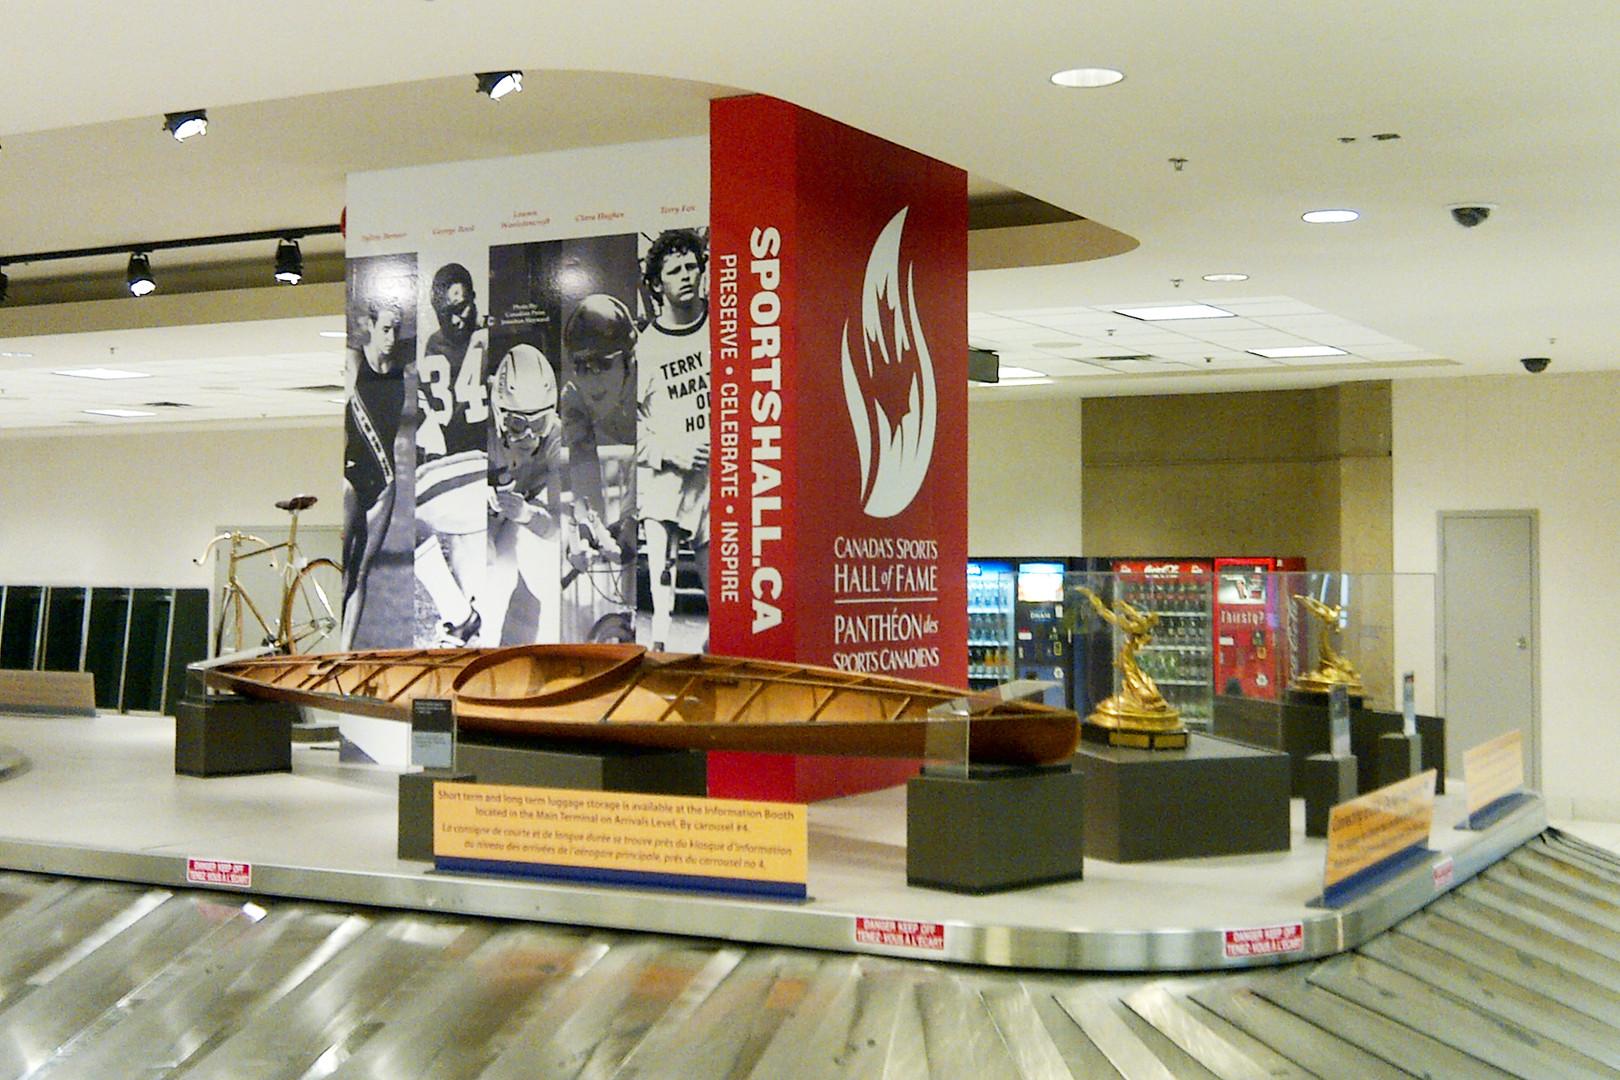 Calgary International Airport Installation